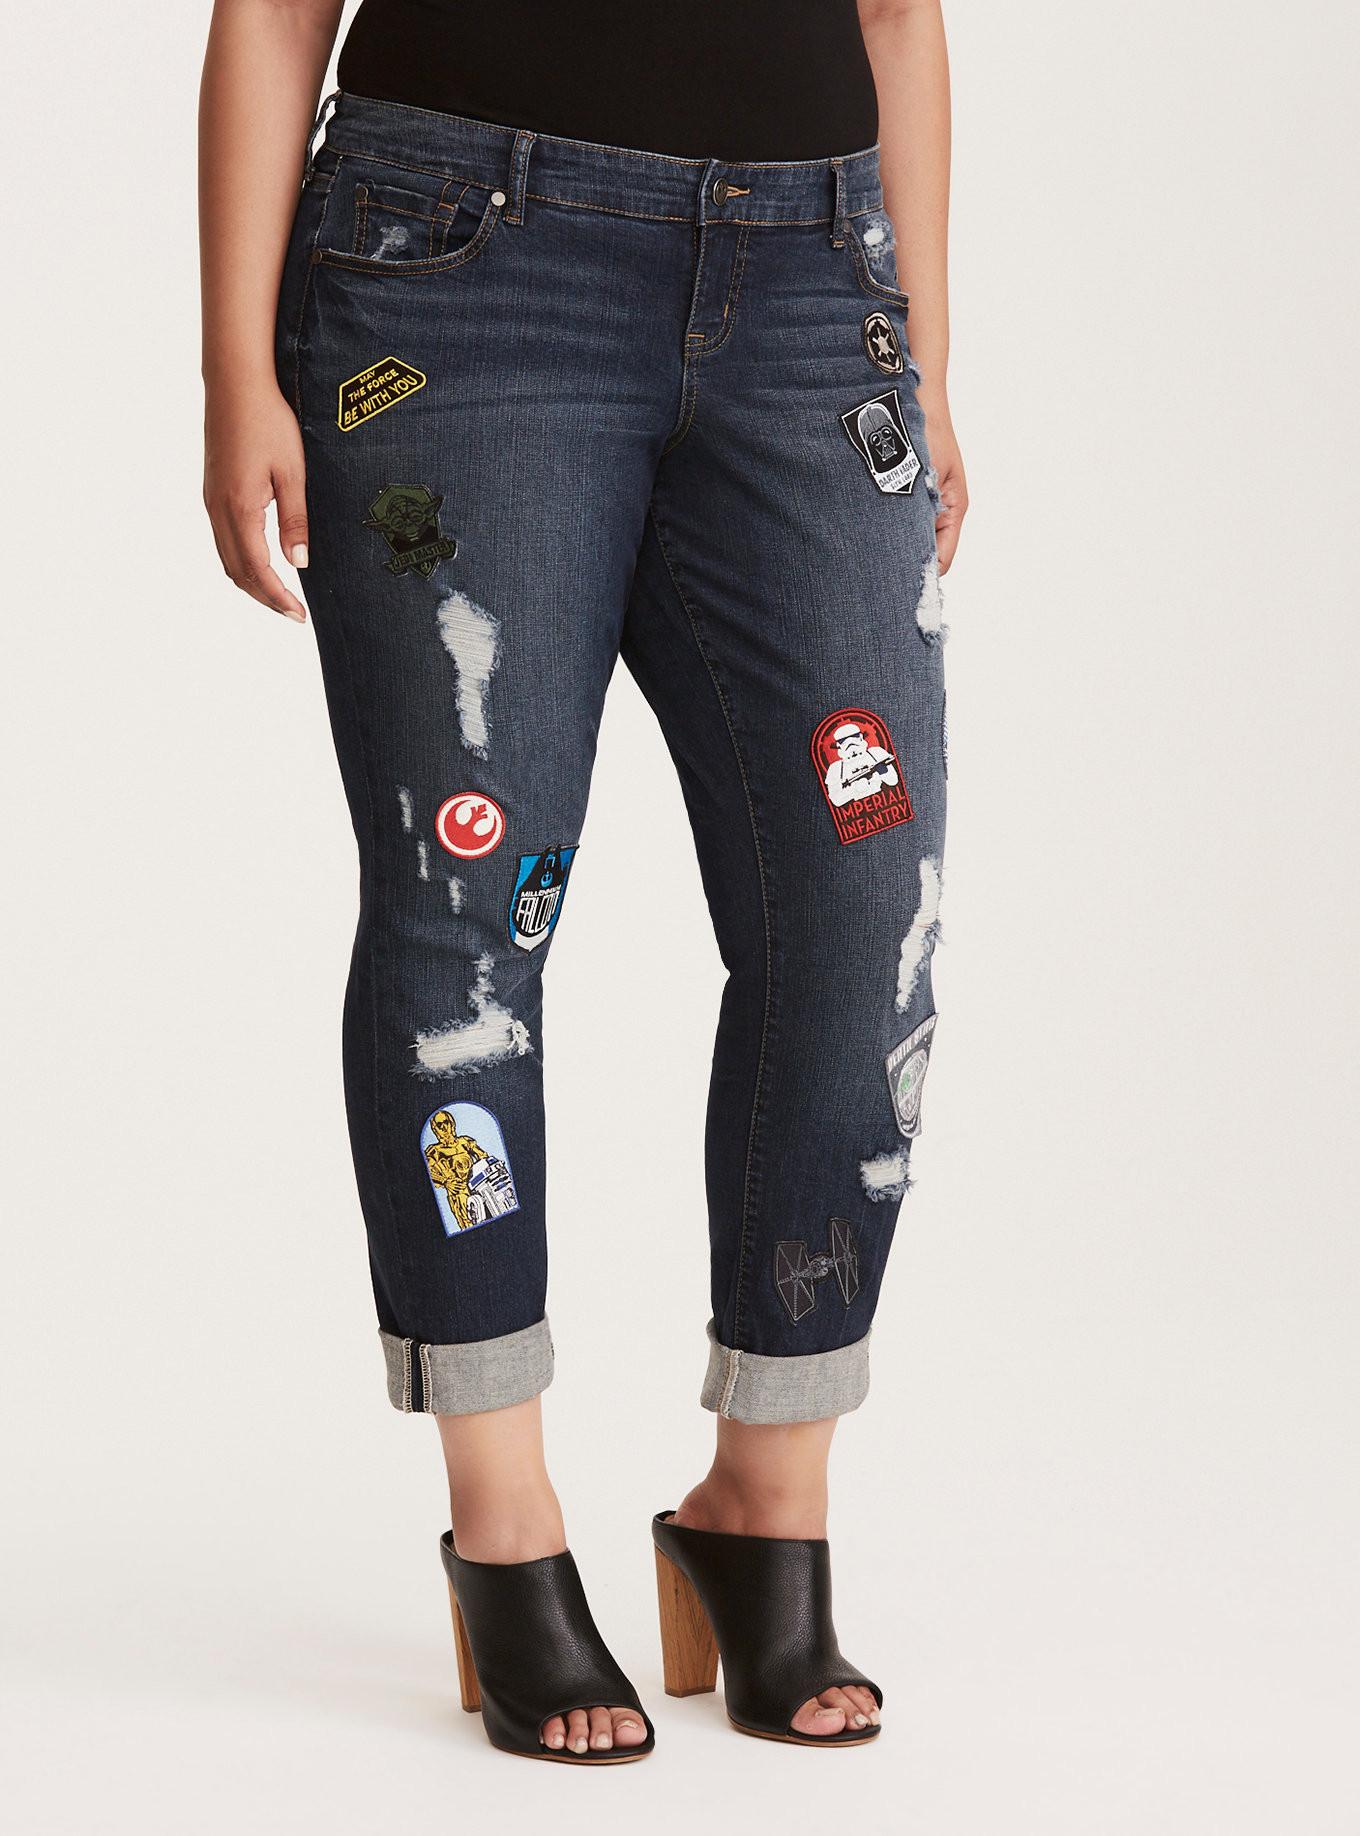 Women S Star Wars Patch Jeans At Torrid The Kessel Runway